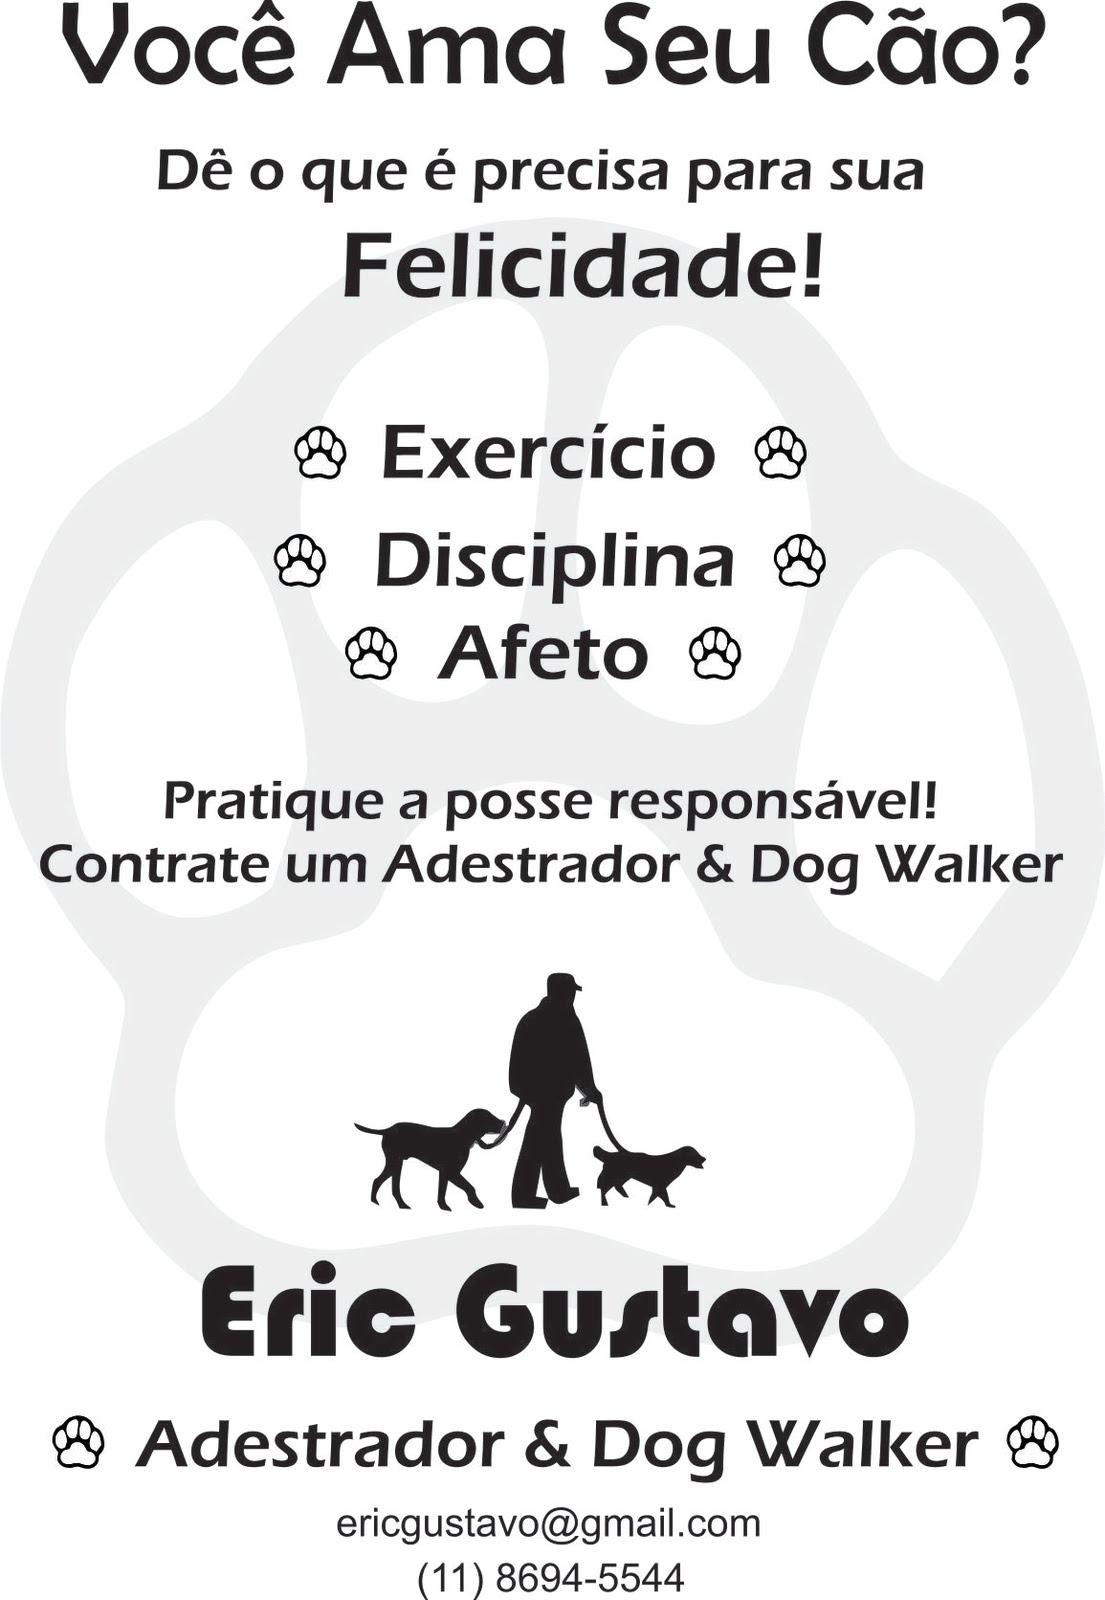 Eric Gustavo